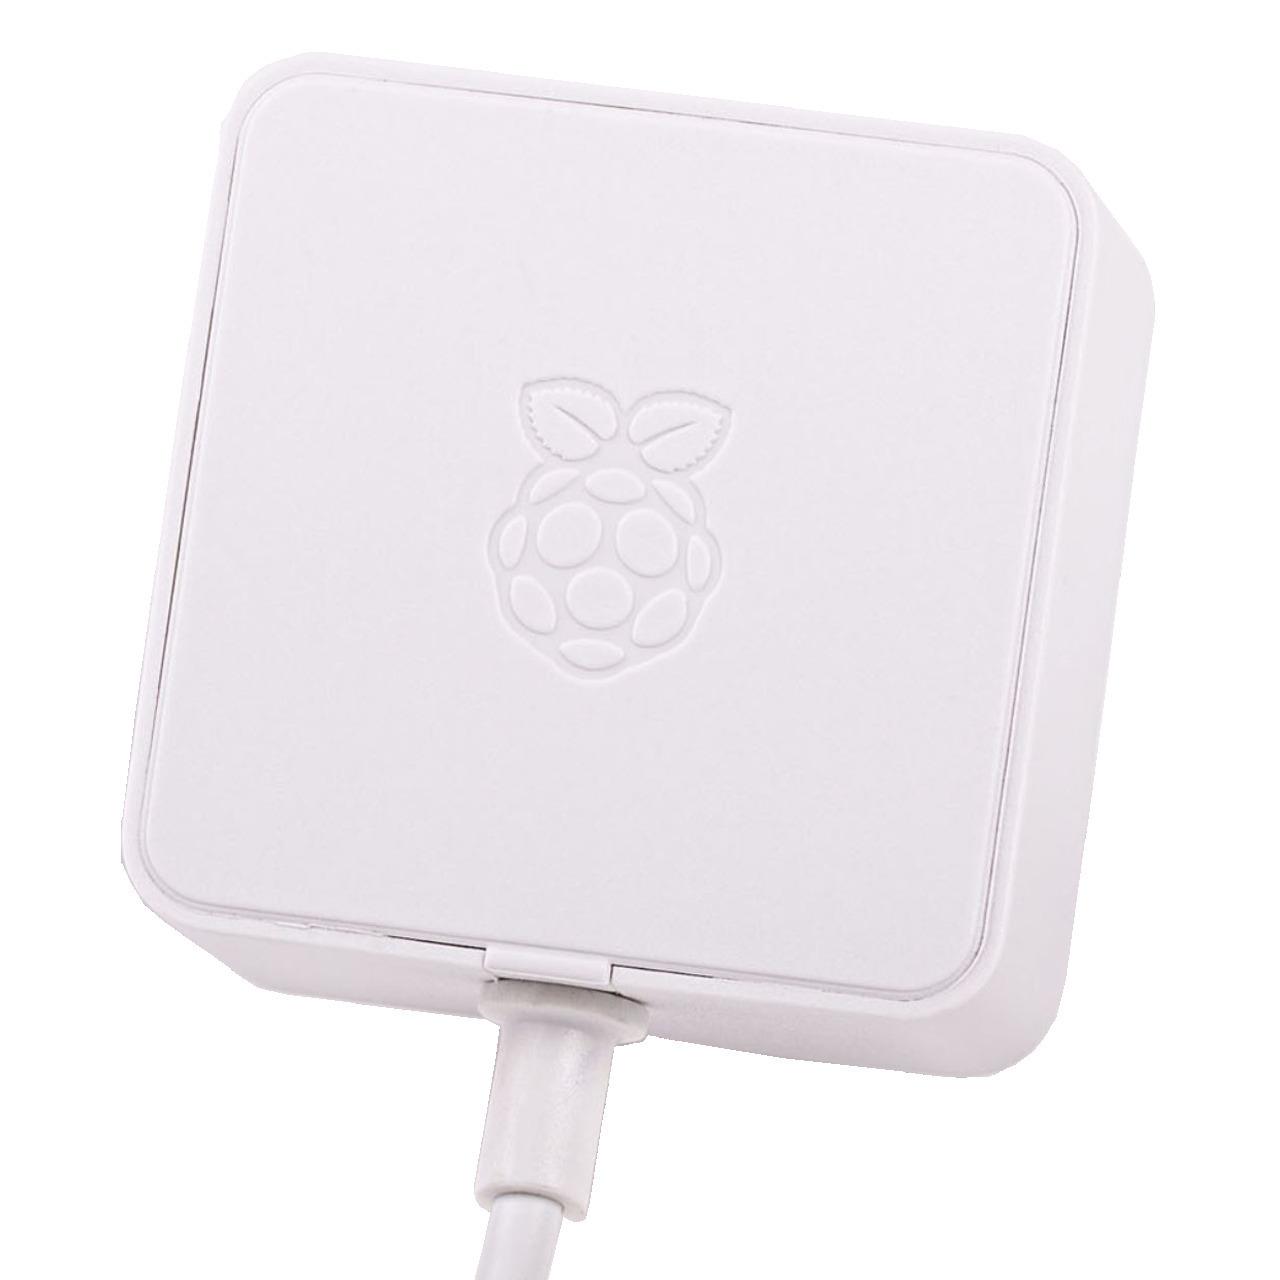 Raspberry Pi 4 USB-Netzteil Typ C- 5-1 V 3A- 1-5 m Kabel- weiund-223